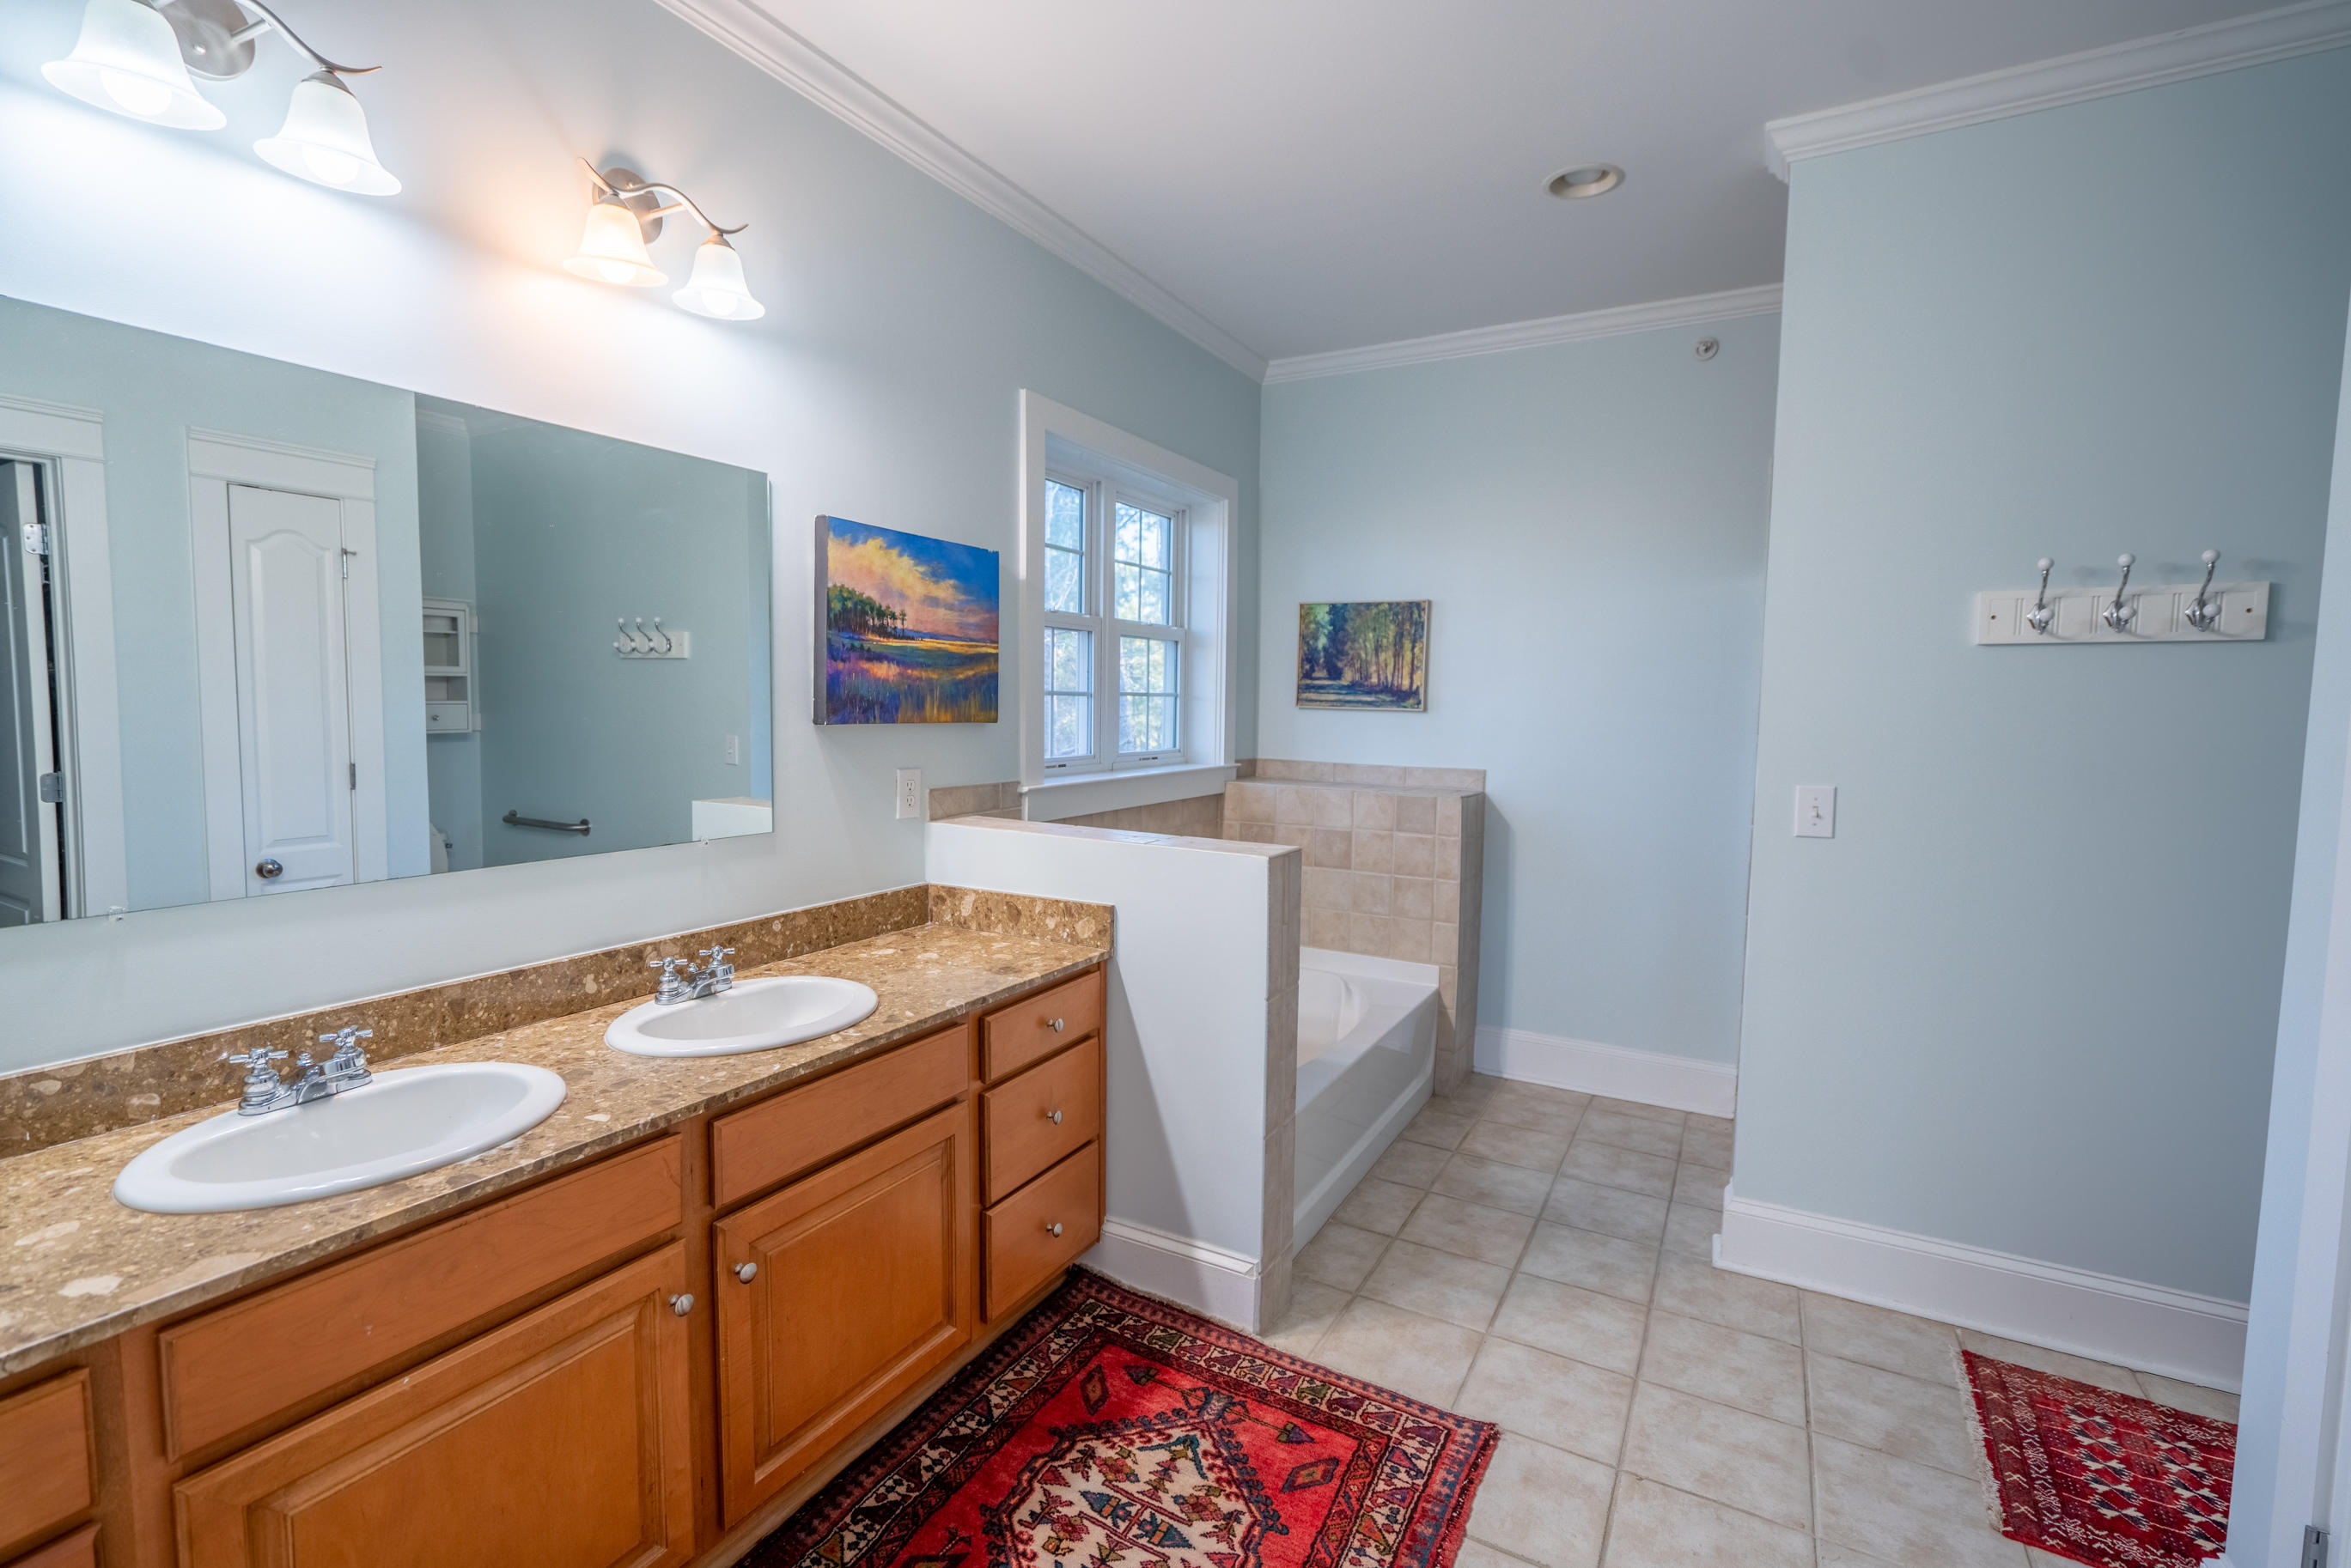 Etiwan Pointe Homes For Sale - 132 Winding Creek, Mount Pleasant, SC - 3